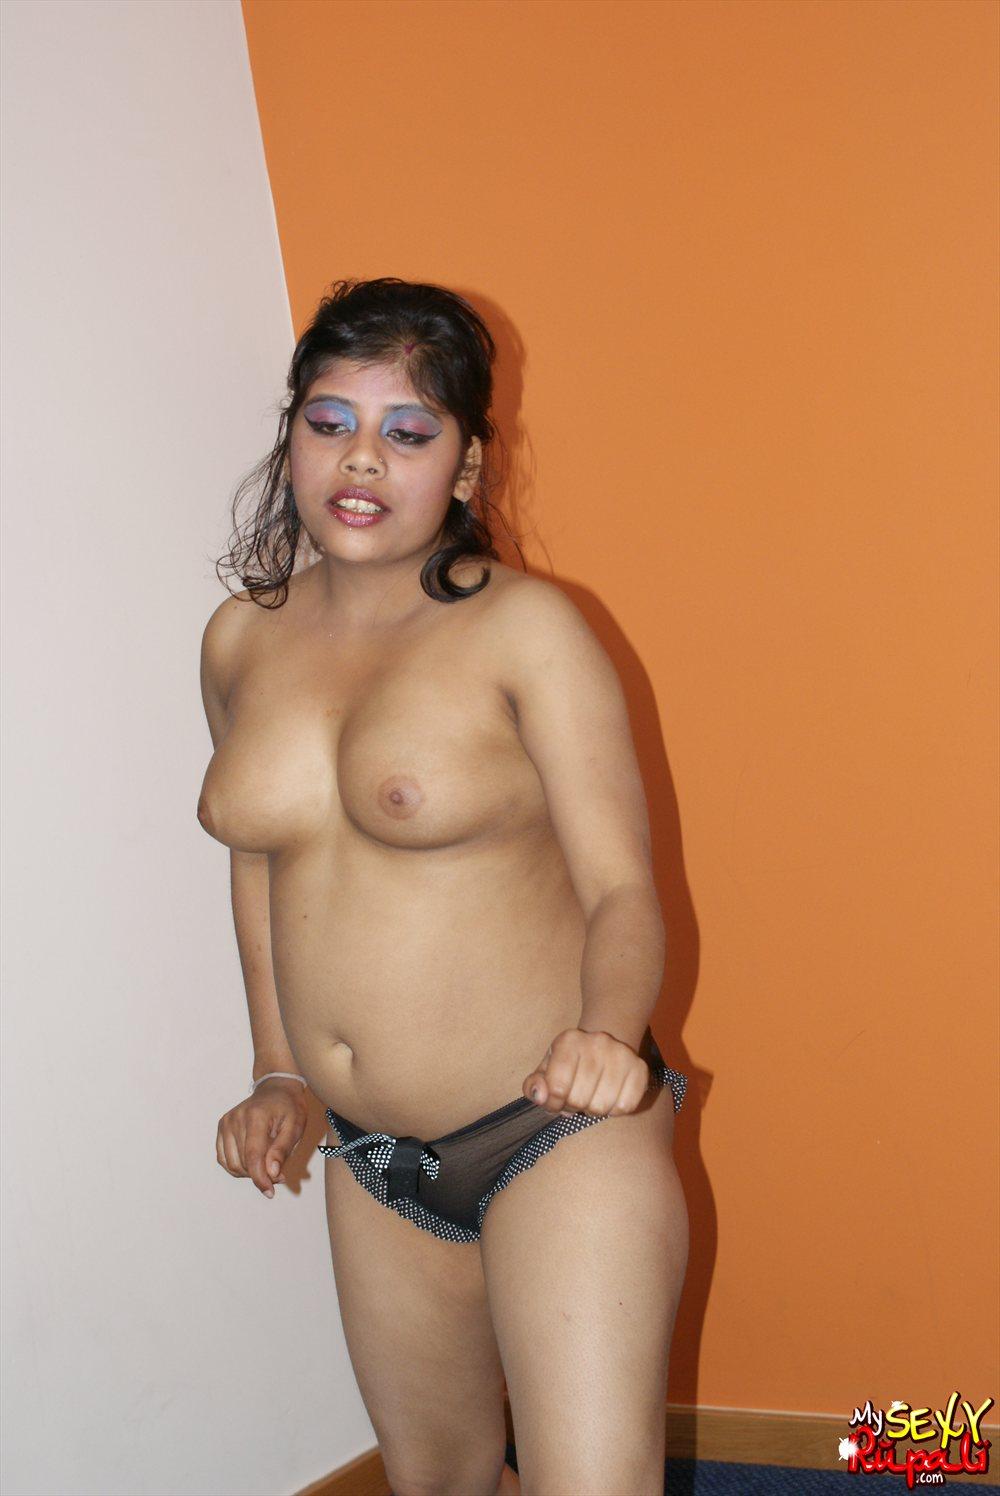 stephanie mcmahon sex